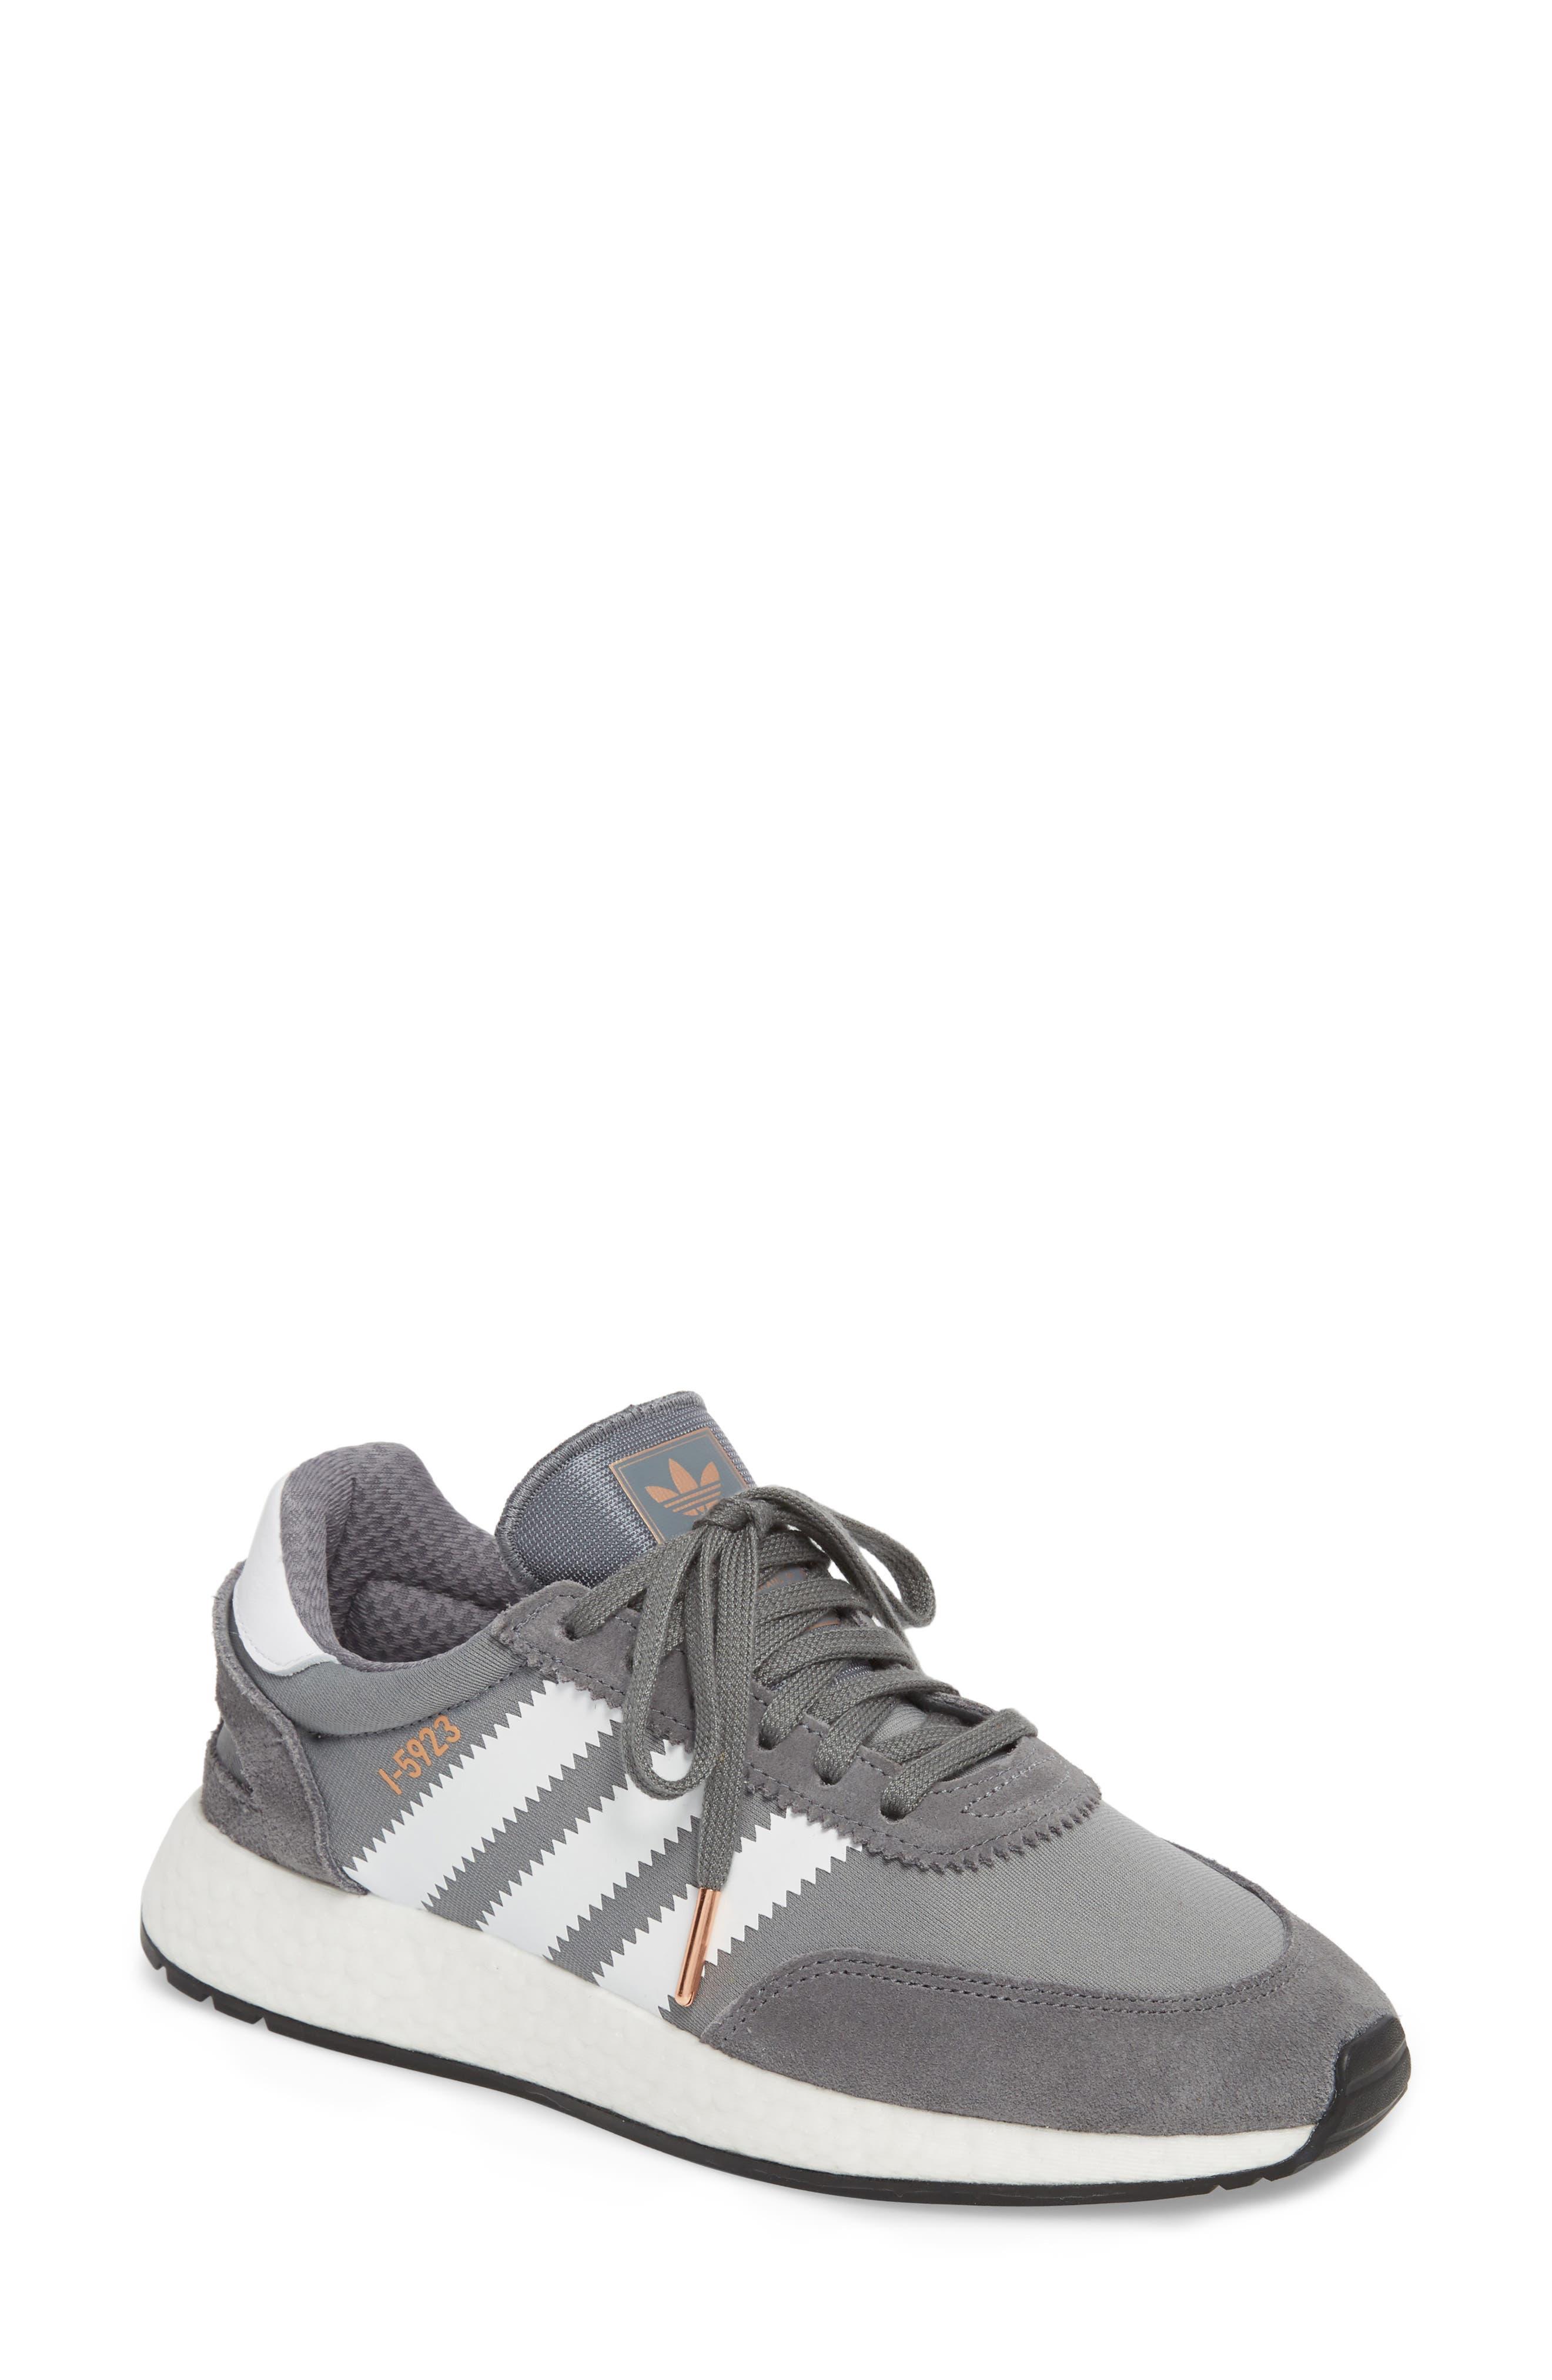 I-5923 Sneaker,                         Main,                         color, Visible Grey/ White/ Black